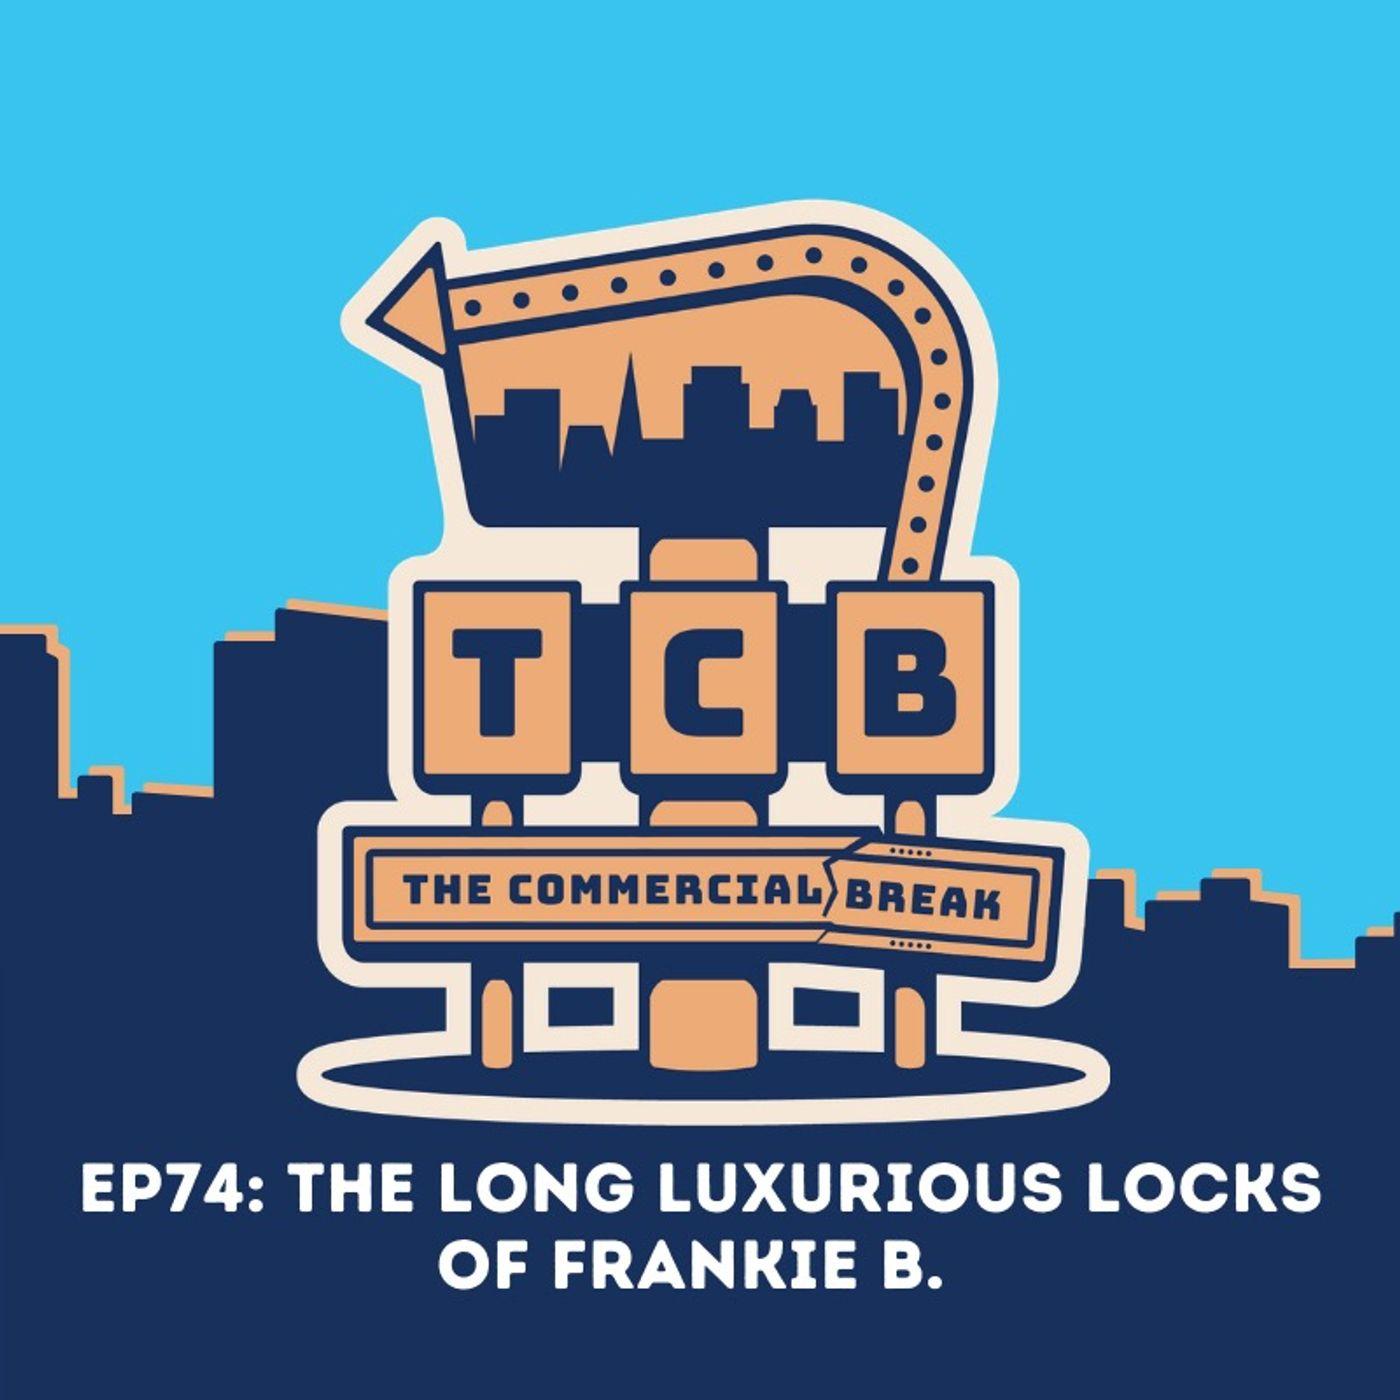 EP74: The Long Luxurious Locks Of Frankie B.